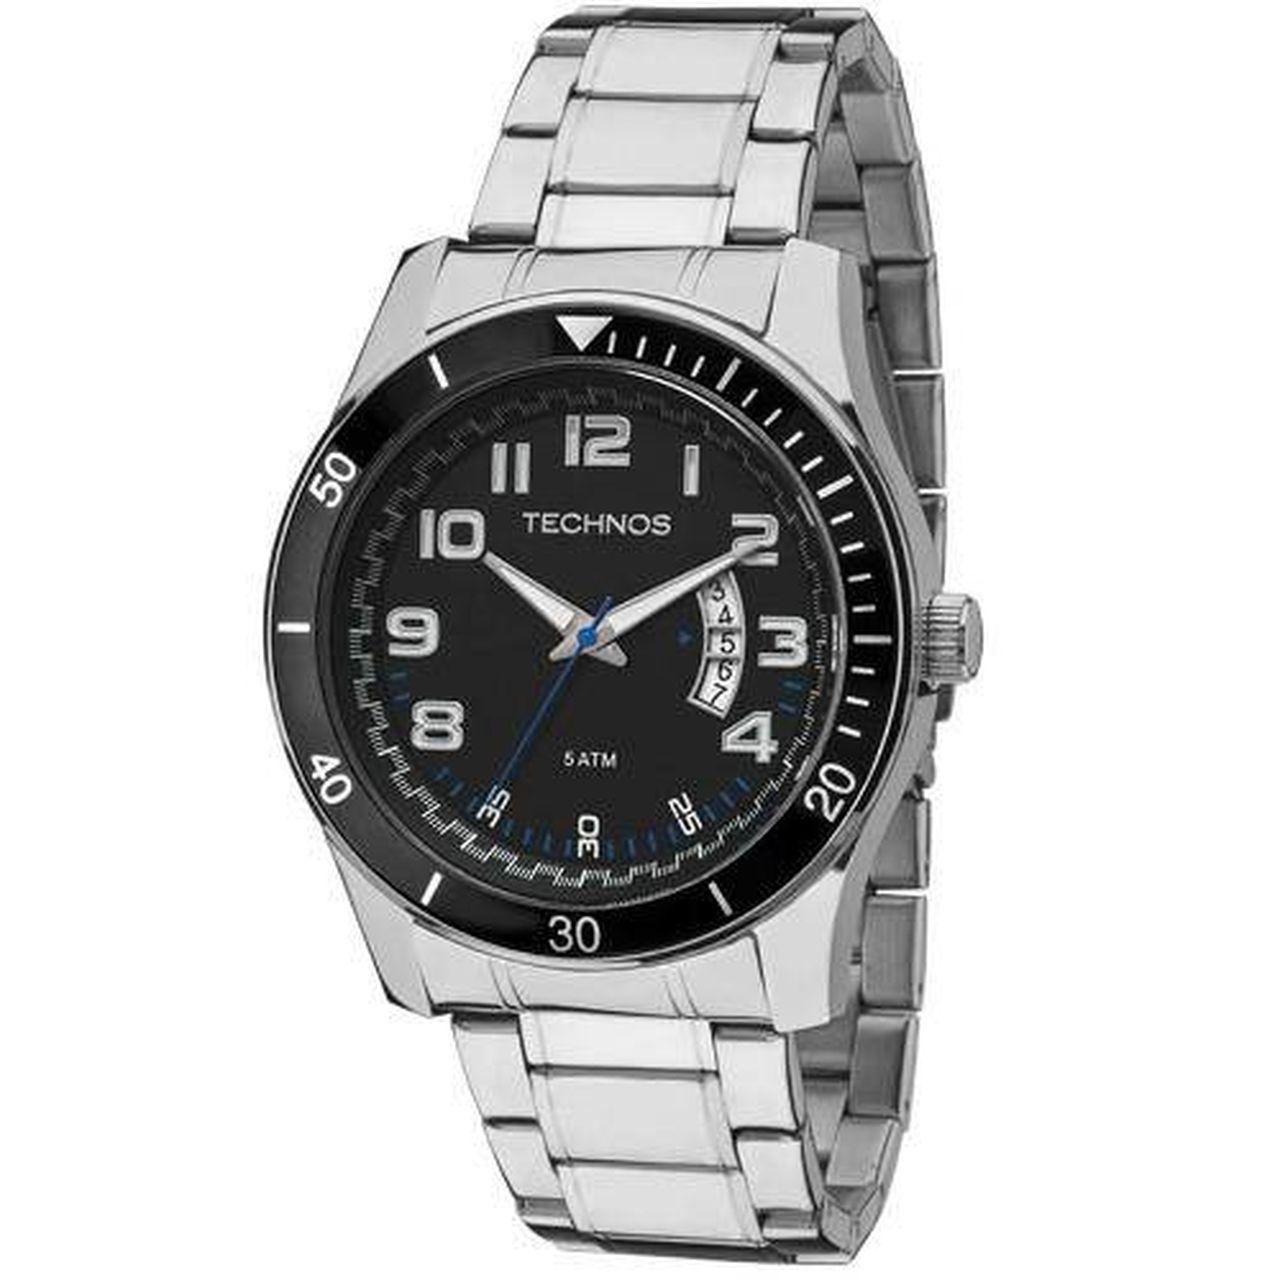 Relógio Technos Performance Racer Masculino 2115ksl/1p Prateado Com Fundo Preto